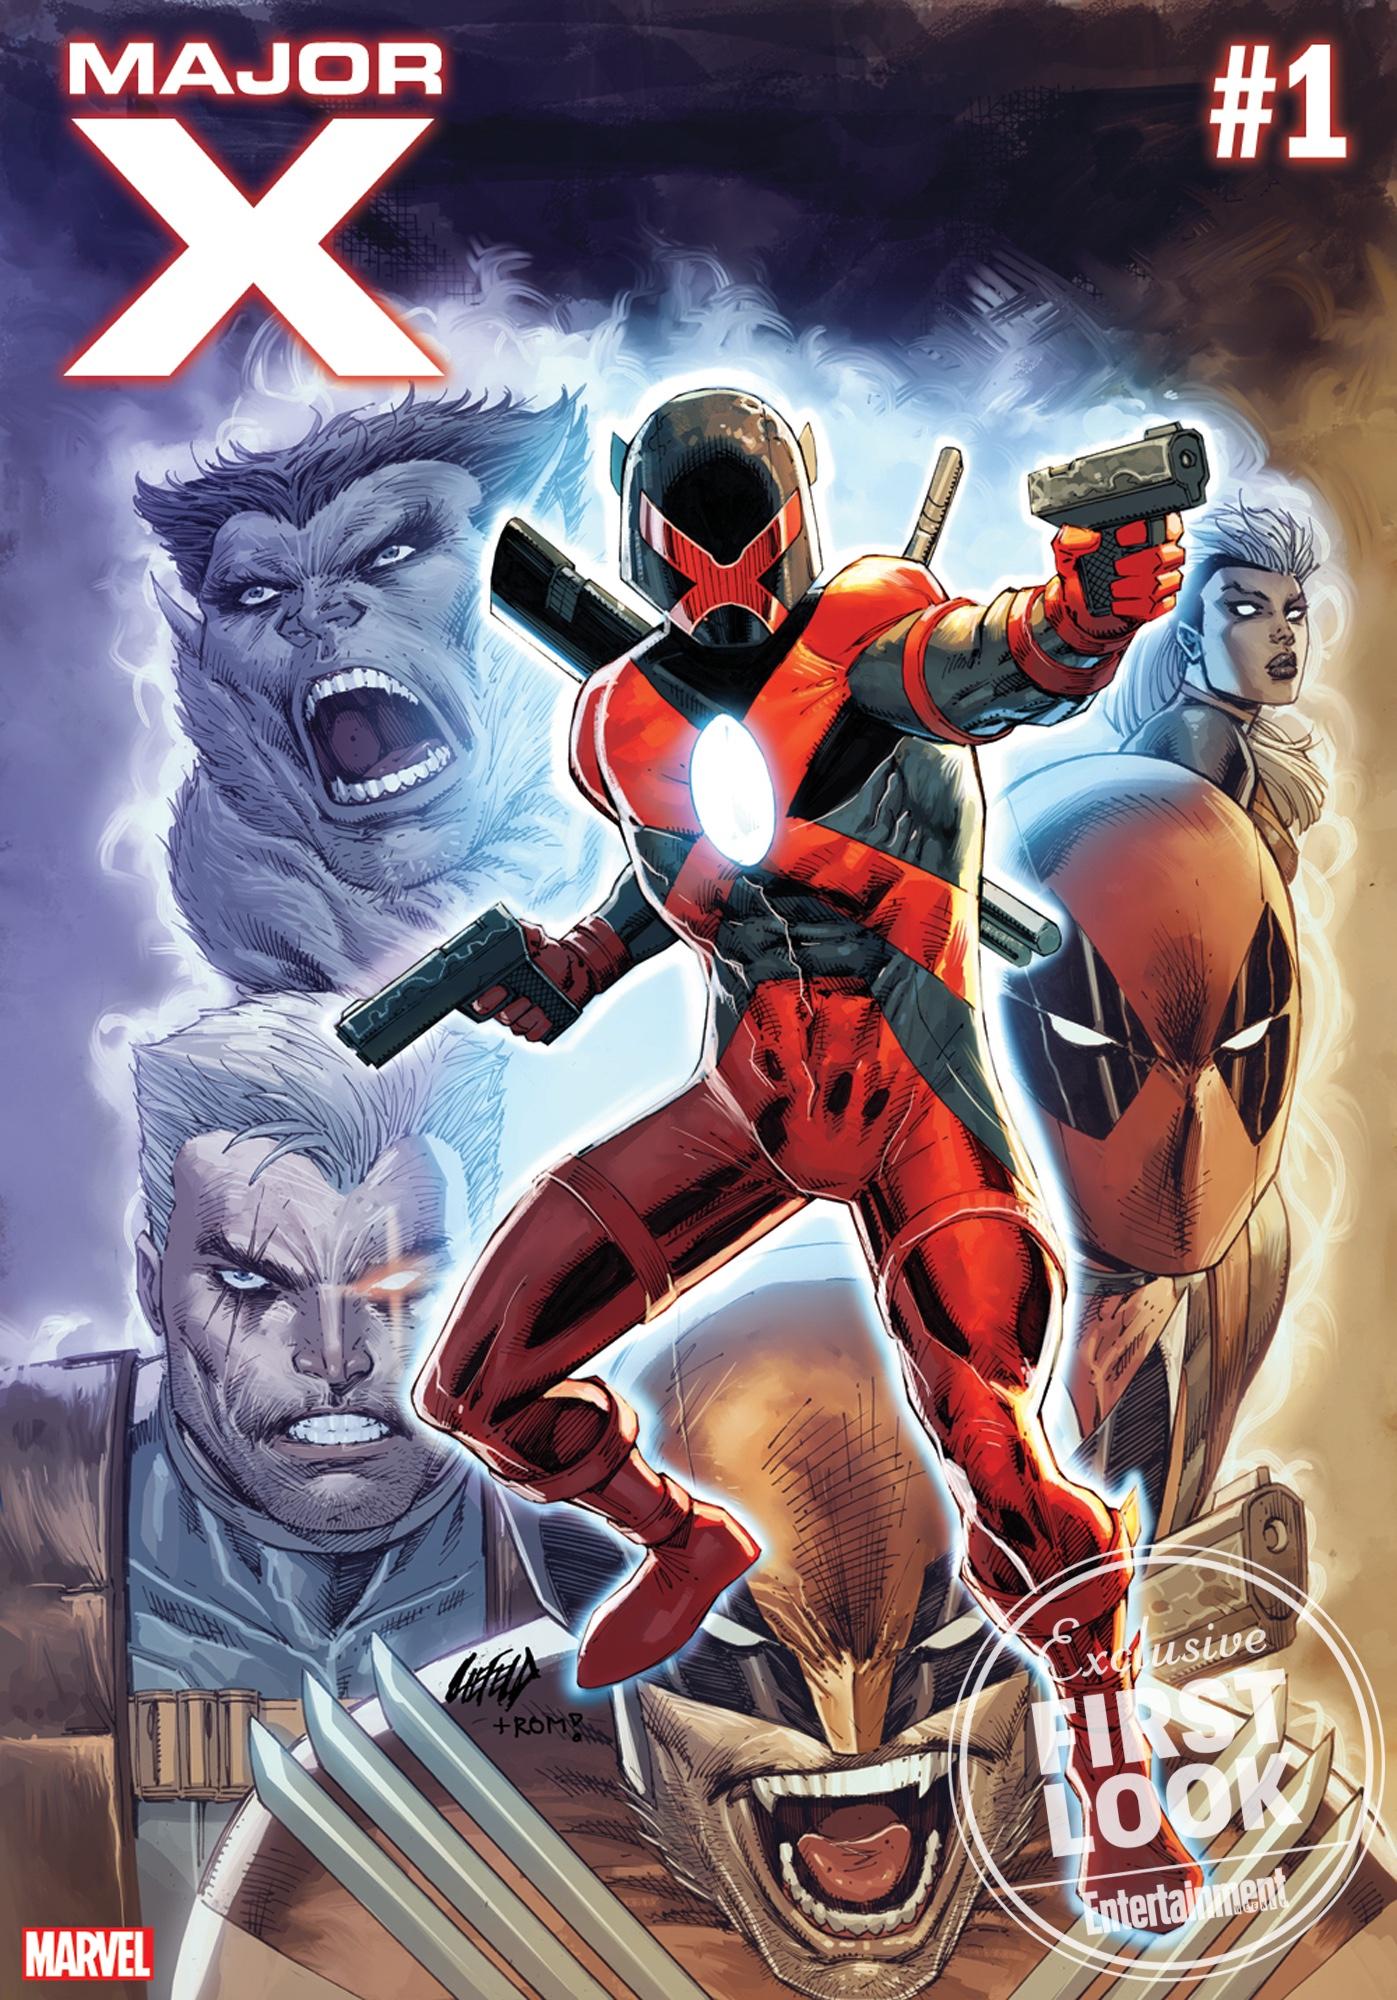 Major X #1 par Rob Liefeld